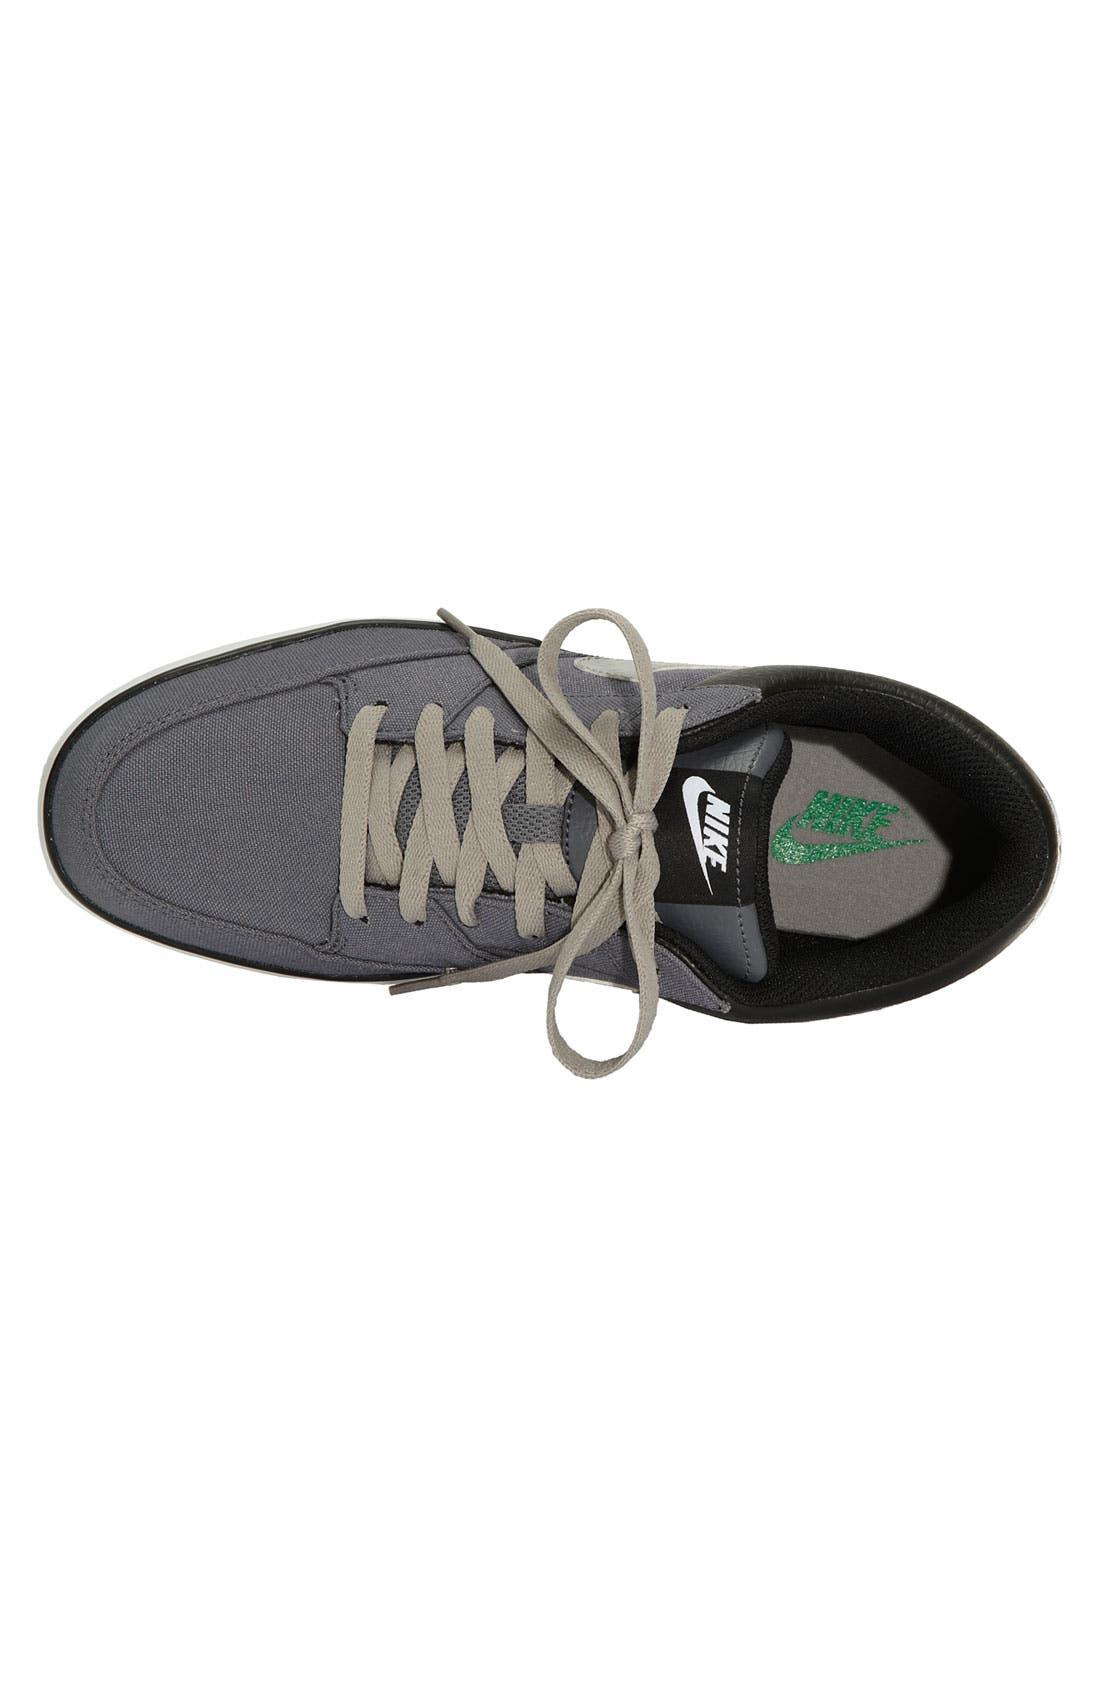 NIKE,                             'Avid' Sneaker,                             Alternate thumbnail 2, color,                             002